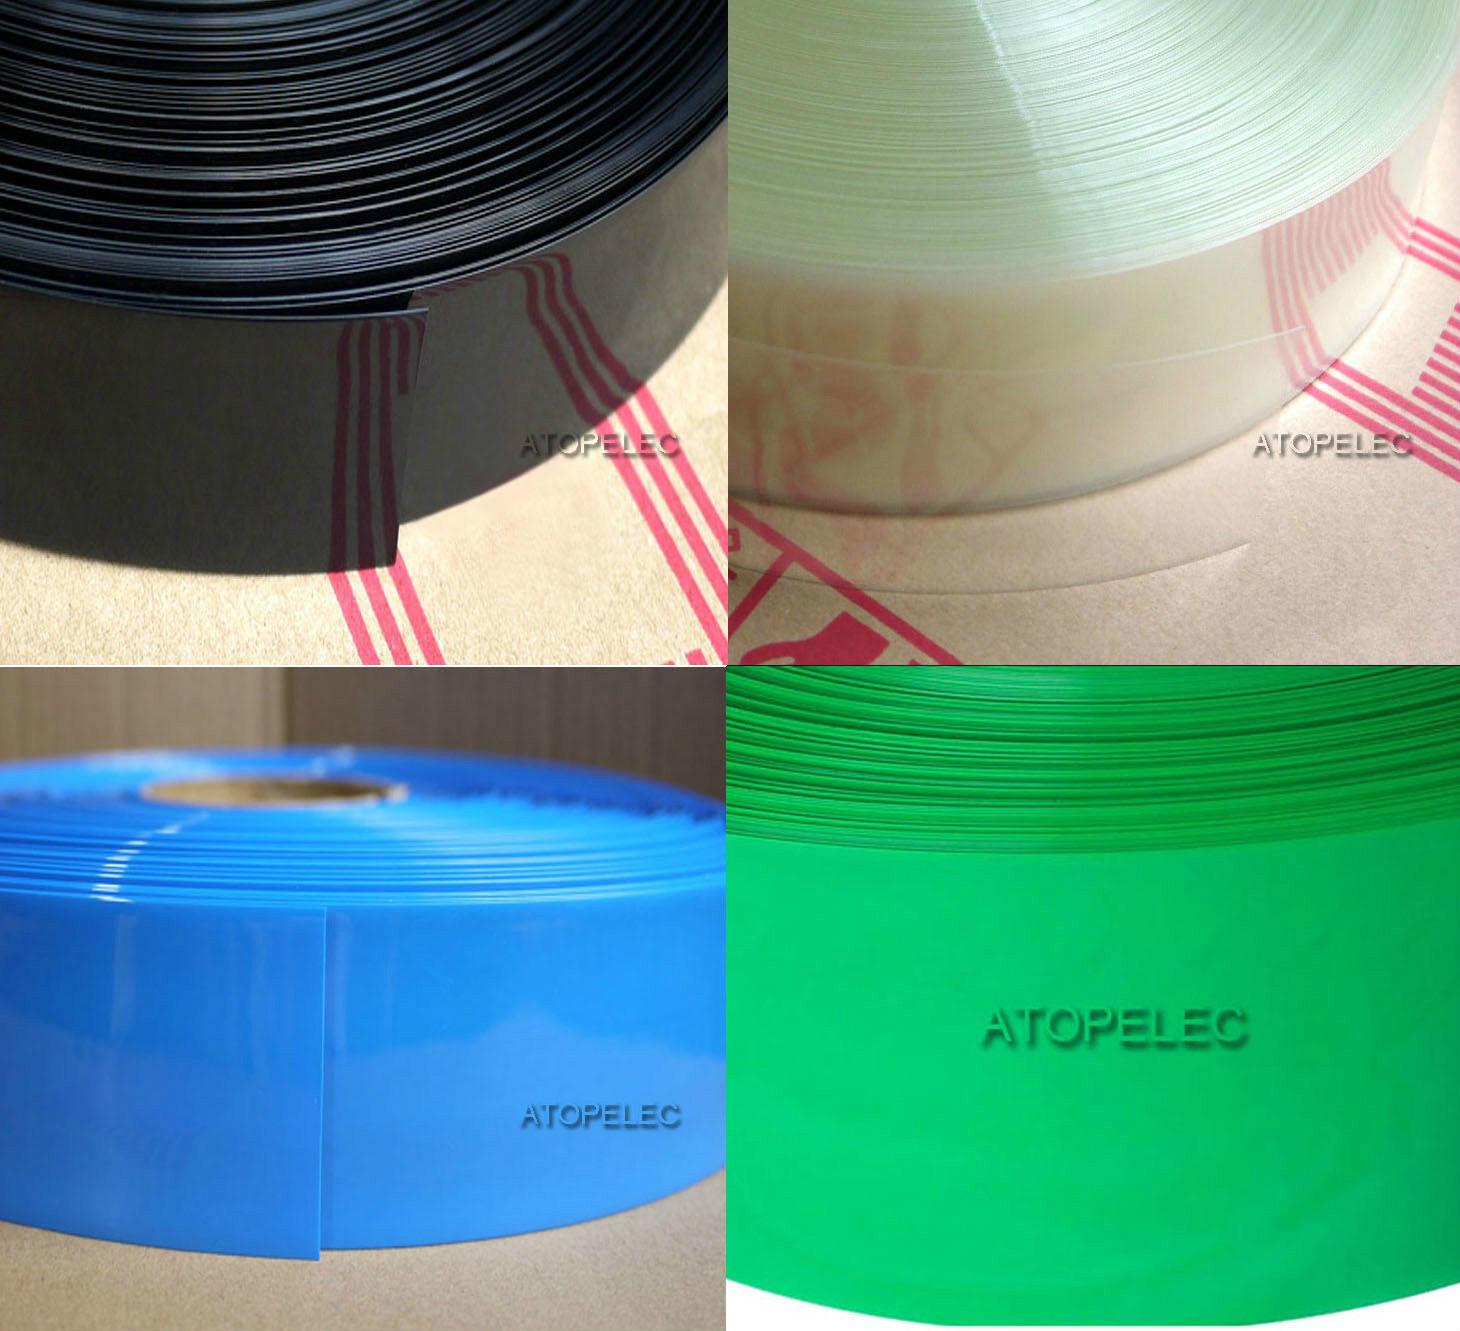 188MM Wide Φ118MM PVC Heat Shrink Tubing Battery Wrap